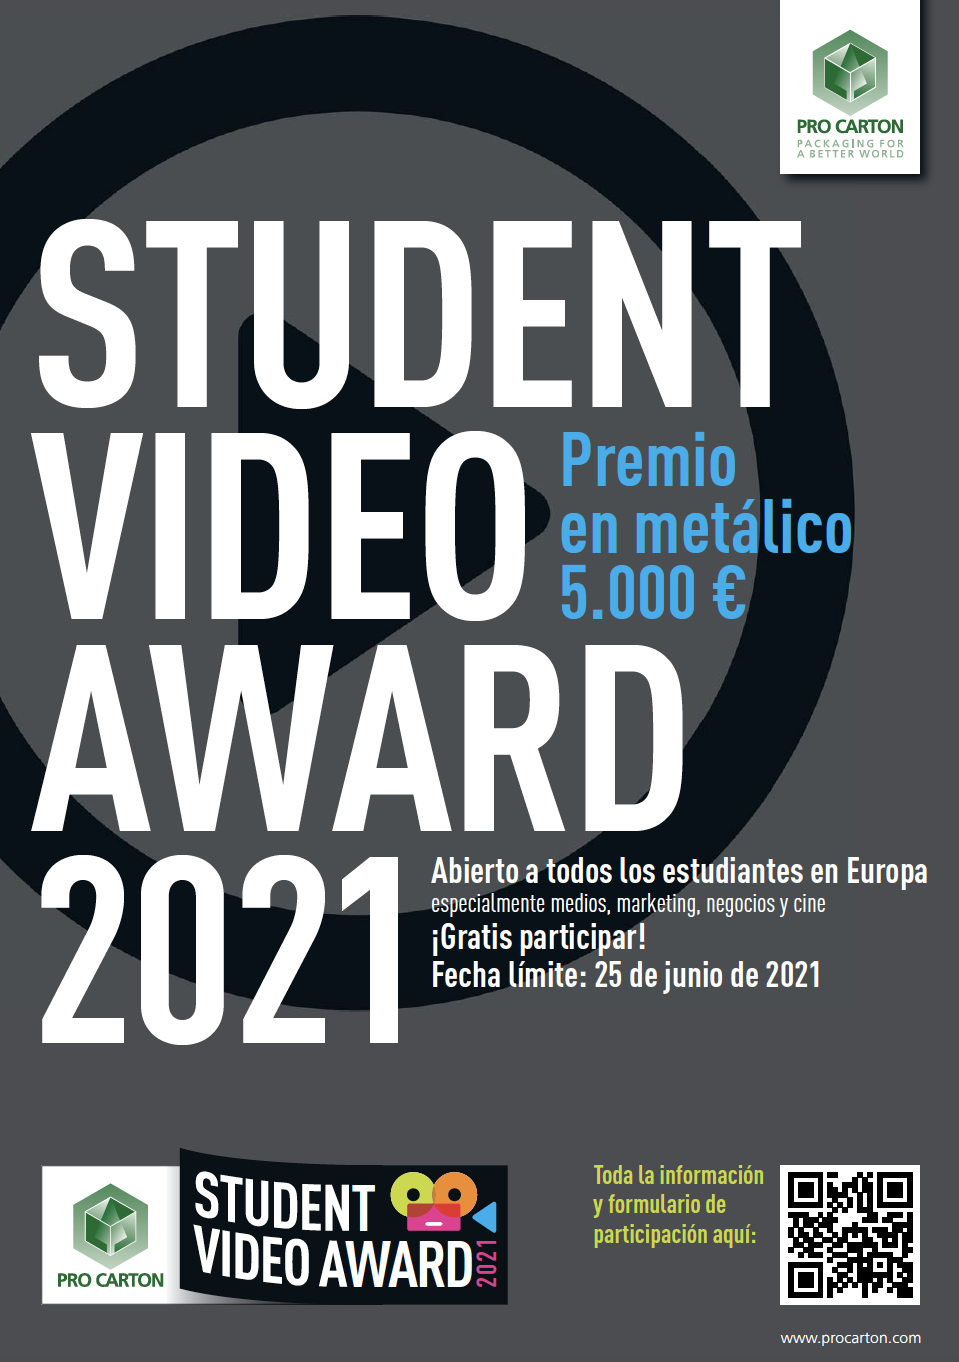 2021 Pro Carton Student Video Award